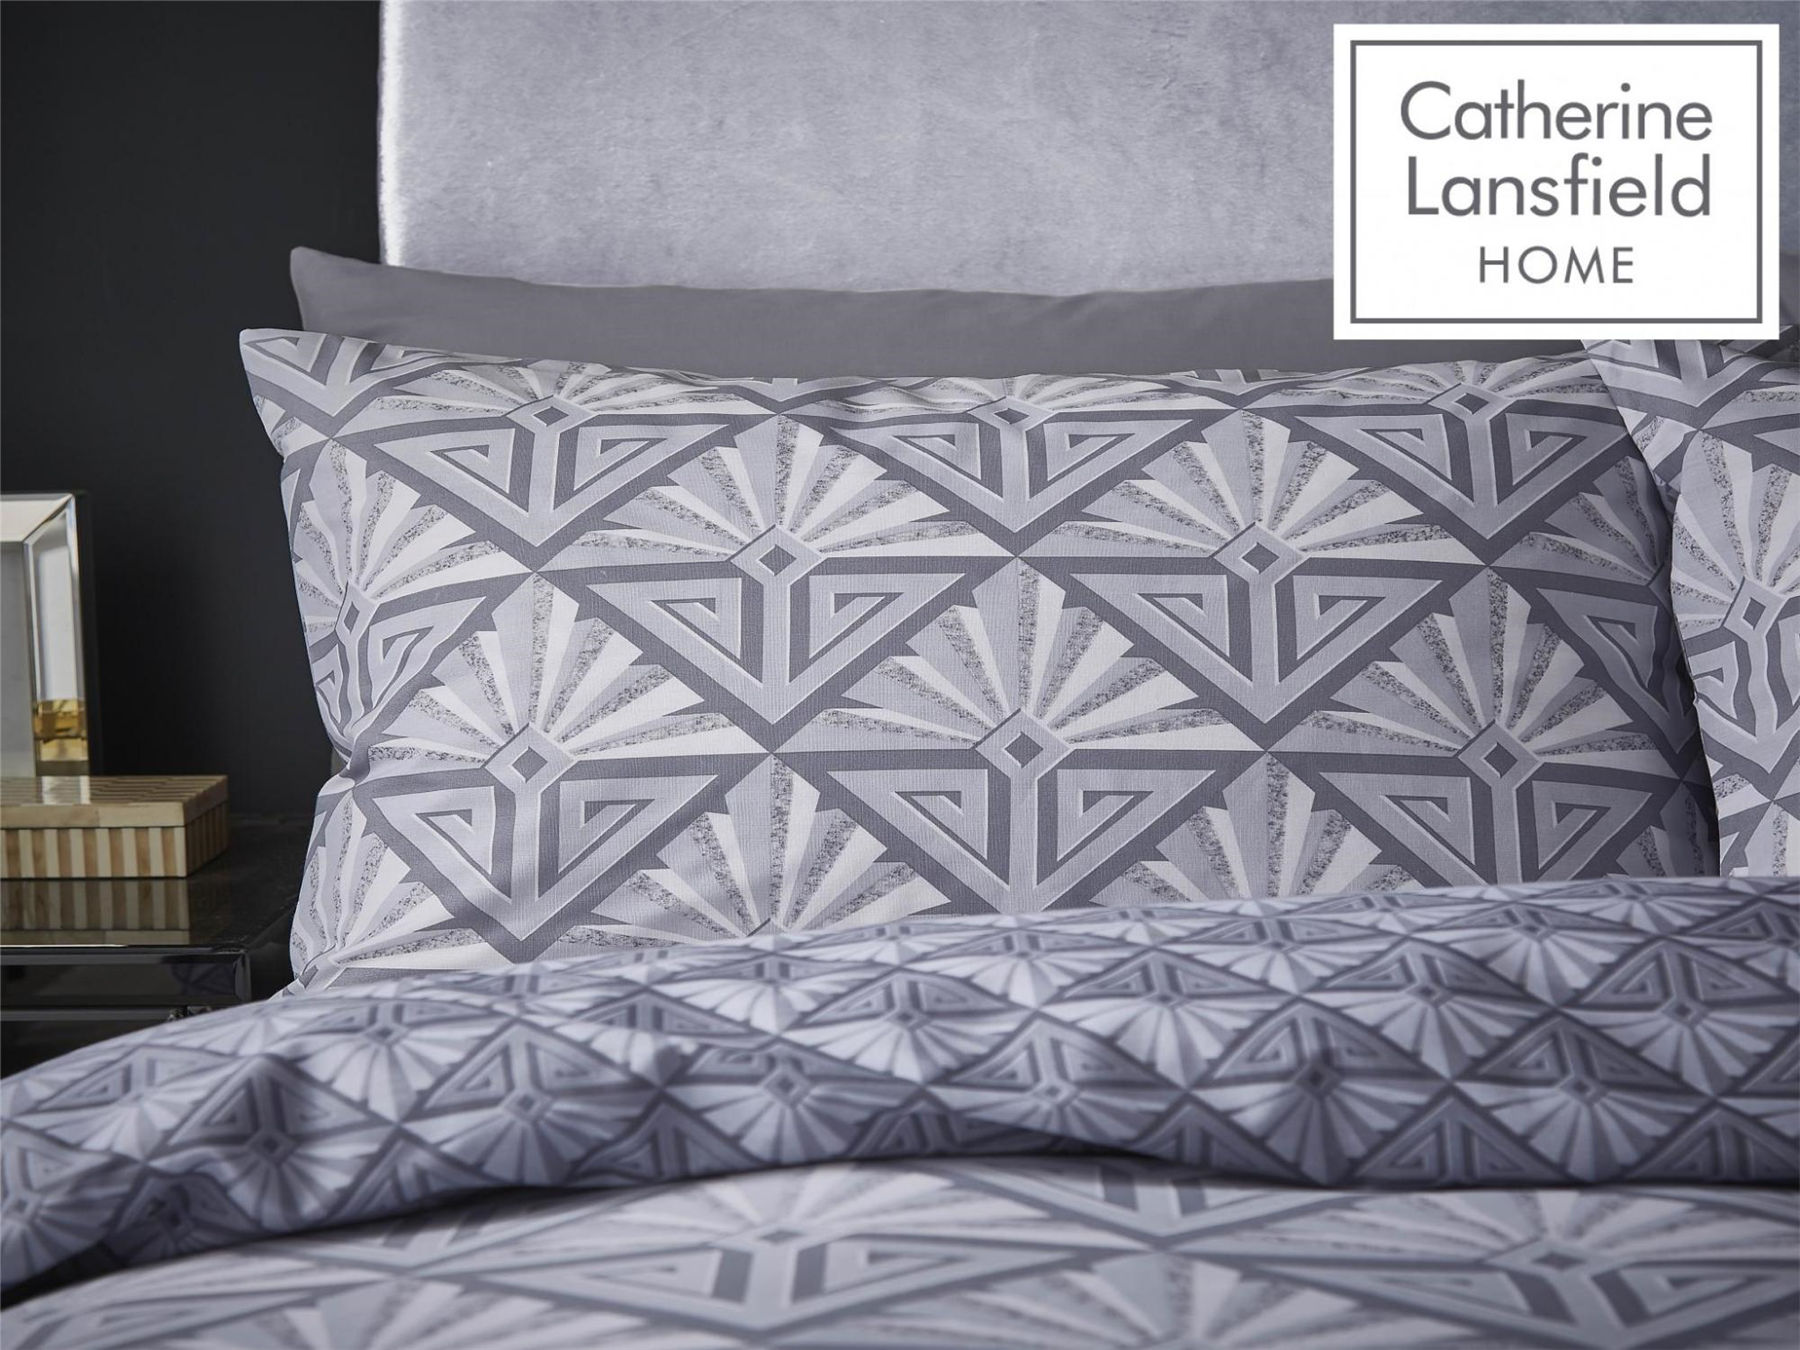 Catherine-Lansfield-Duvet-Set-Reversible-Art-Deco-Grey-Bedding-Pillows-Curtains thumbnail 19